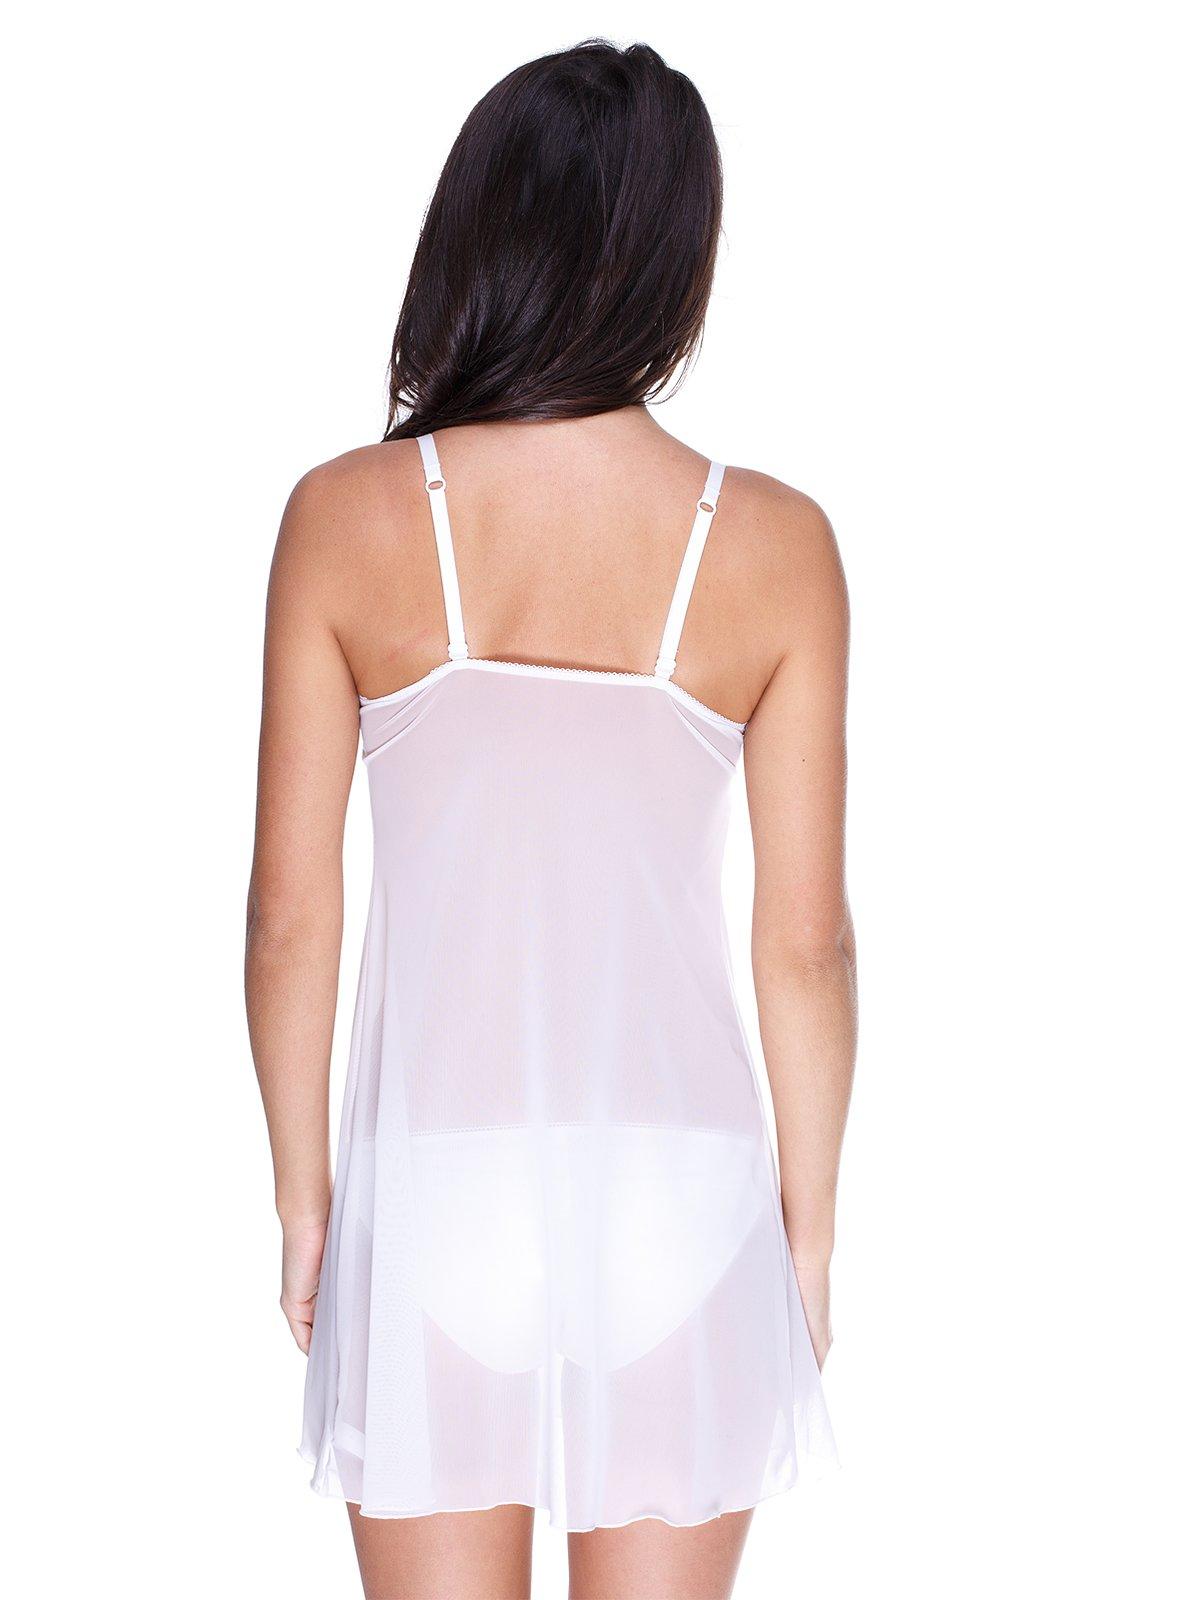 Рубашка ночная белая | 1926611 | фото 2